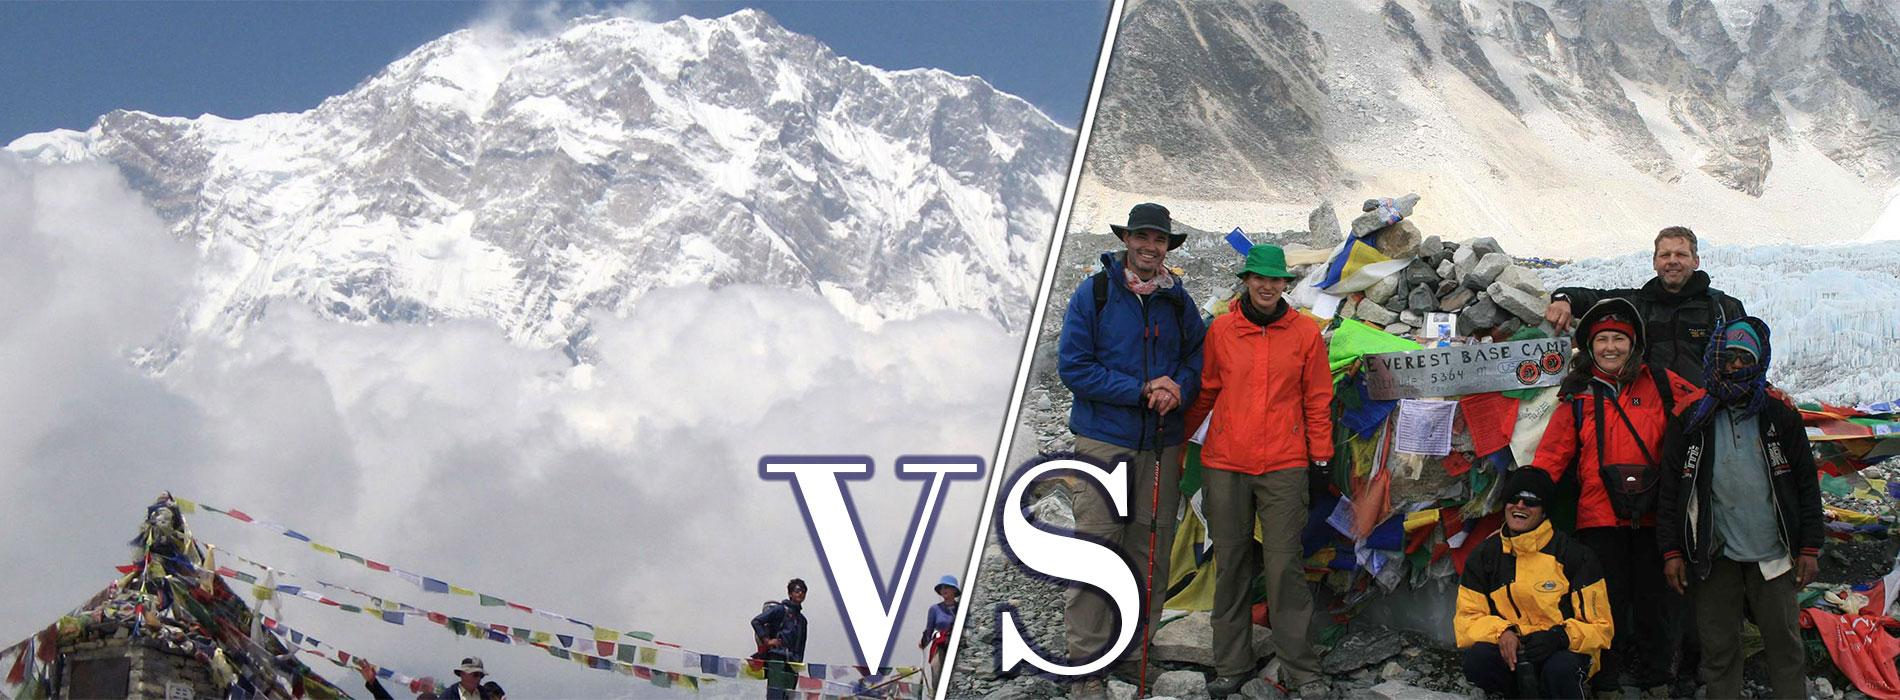 Annapurna VS Everest: Which trek to choose?